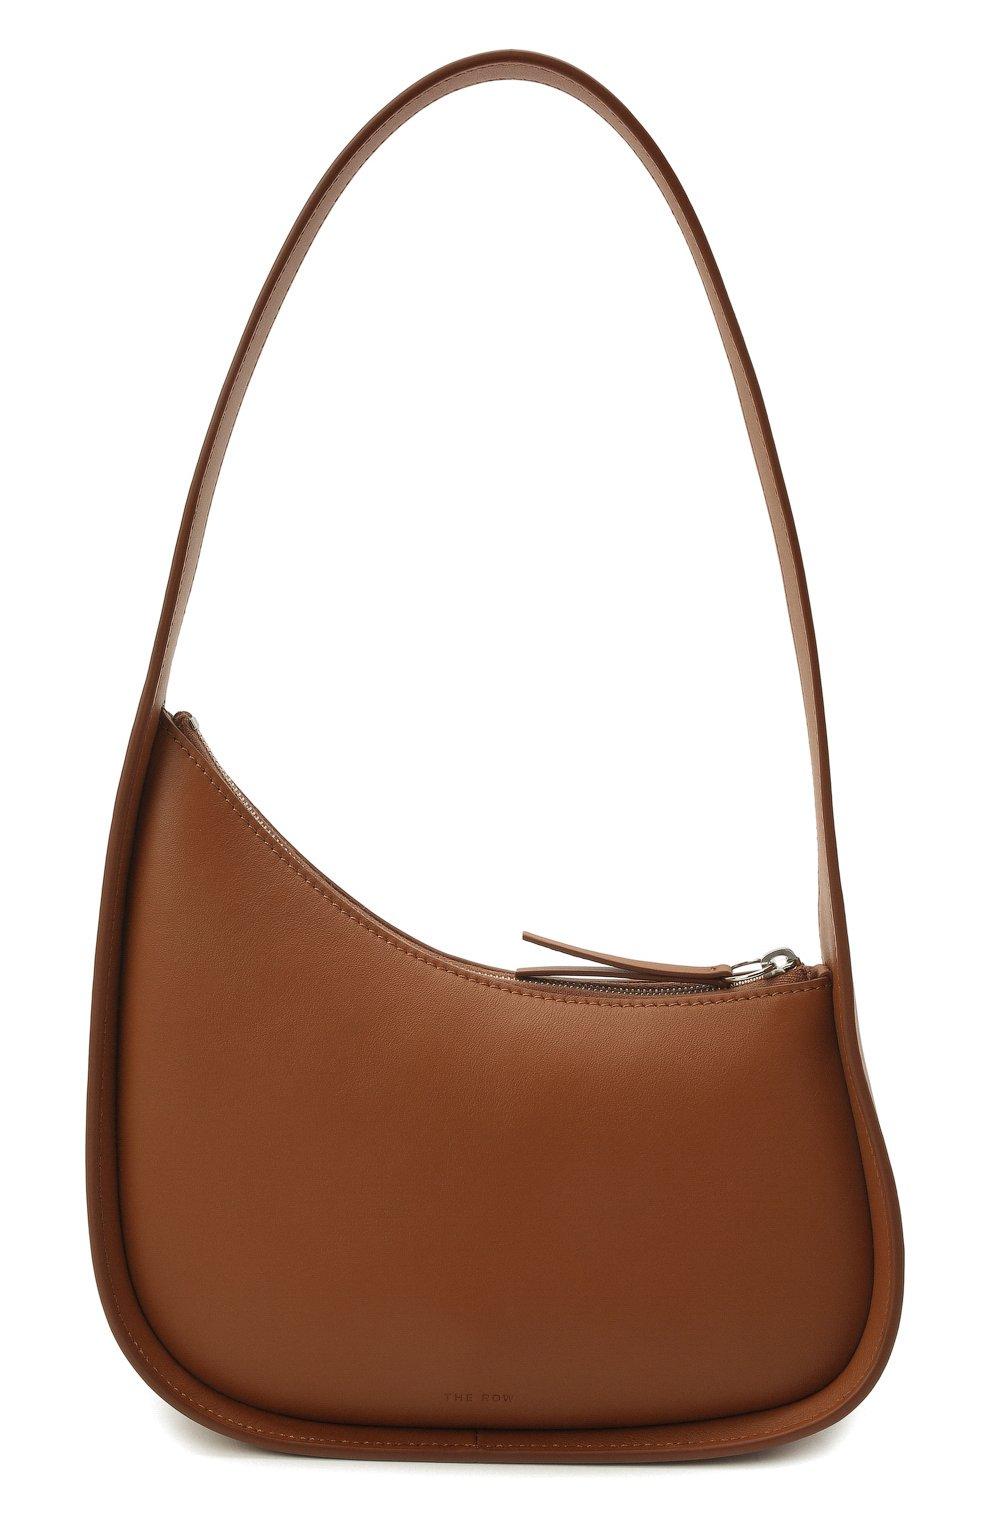 Женская сумка half moon THE ROW коричневого цвета, арт. W1249L52   Фото 1 (Сумки-технические: Сумки top-handle; Материал: Натуральная кожа; Размер: mini)